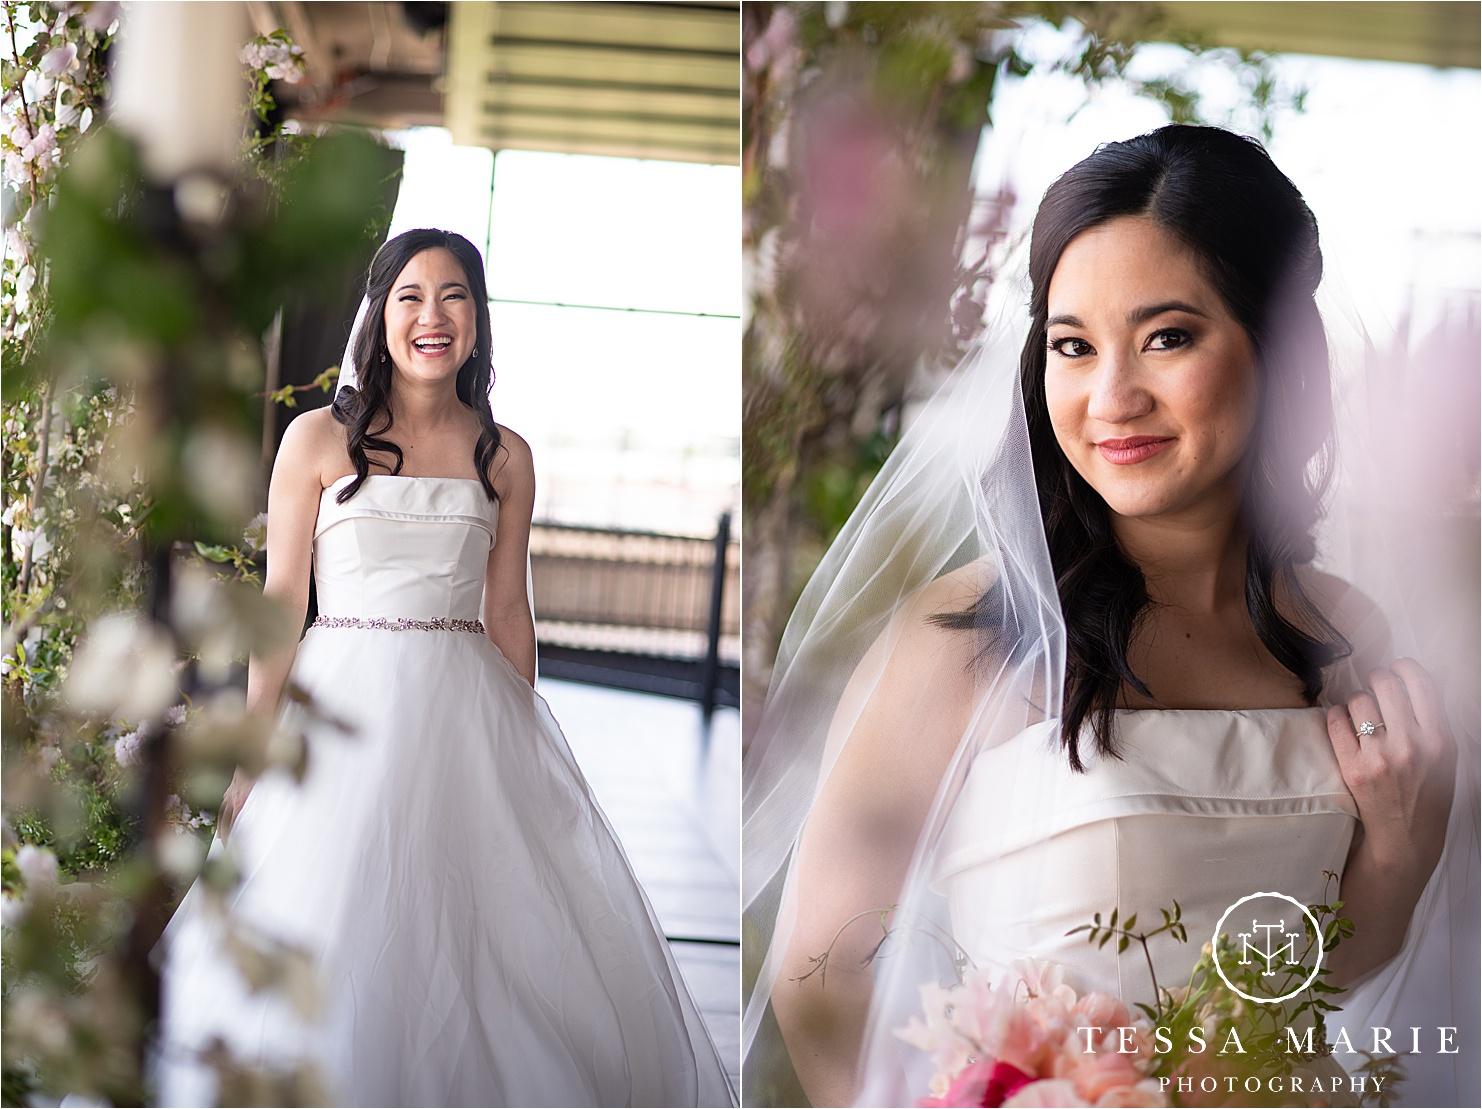 Tessa_marie_weddings_houston_wedding_photographer_The_astorian_0046.jpg